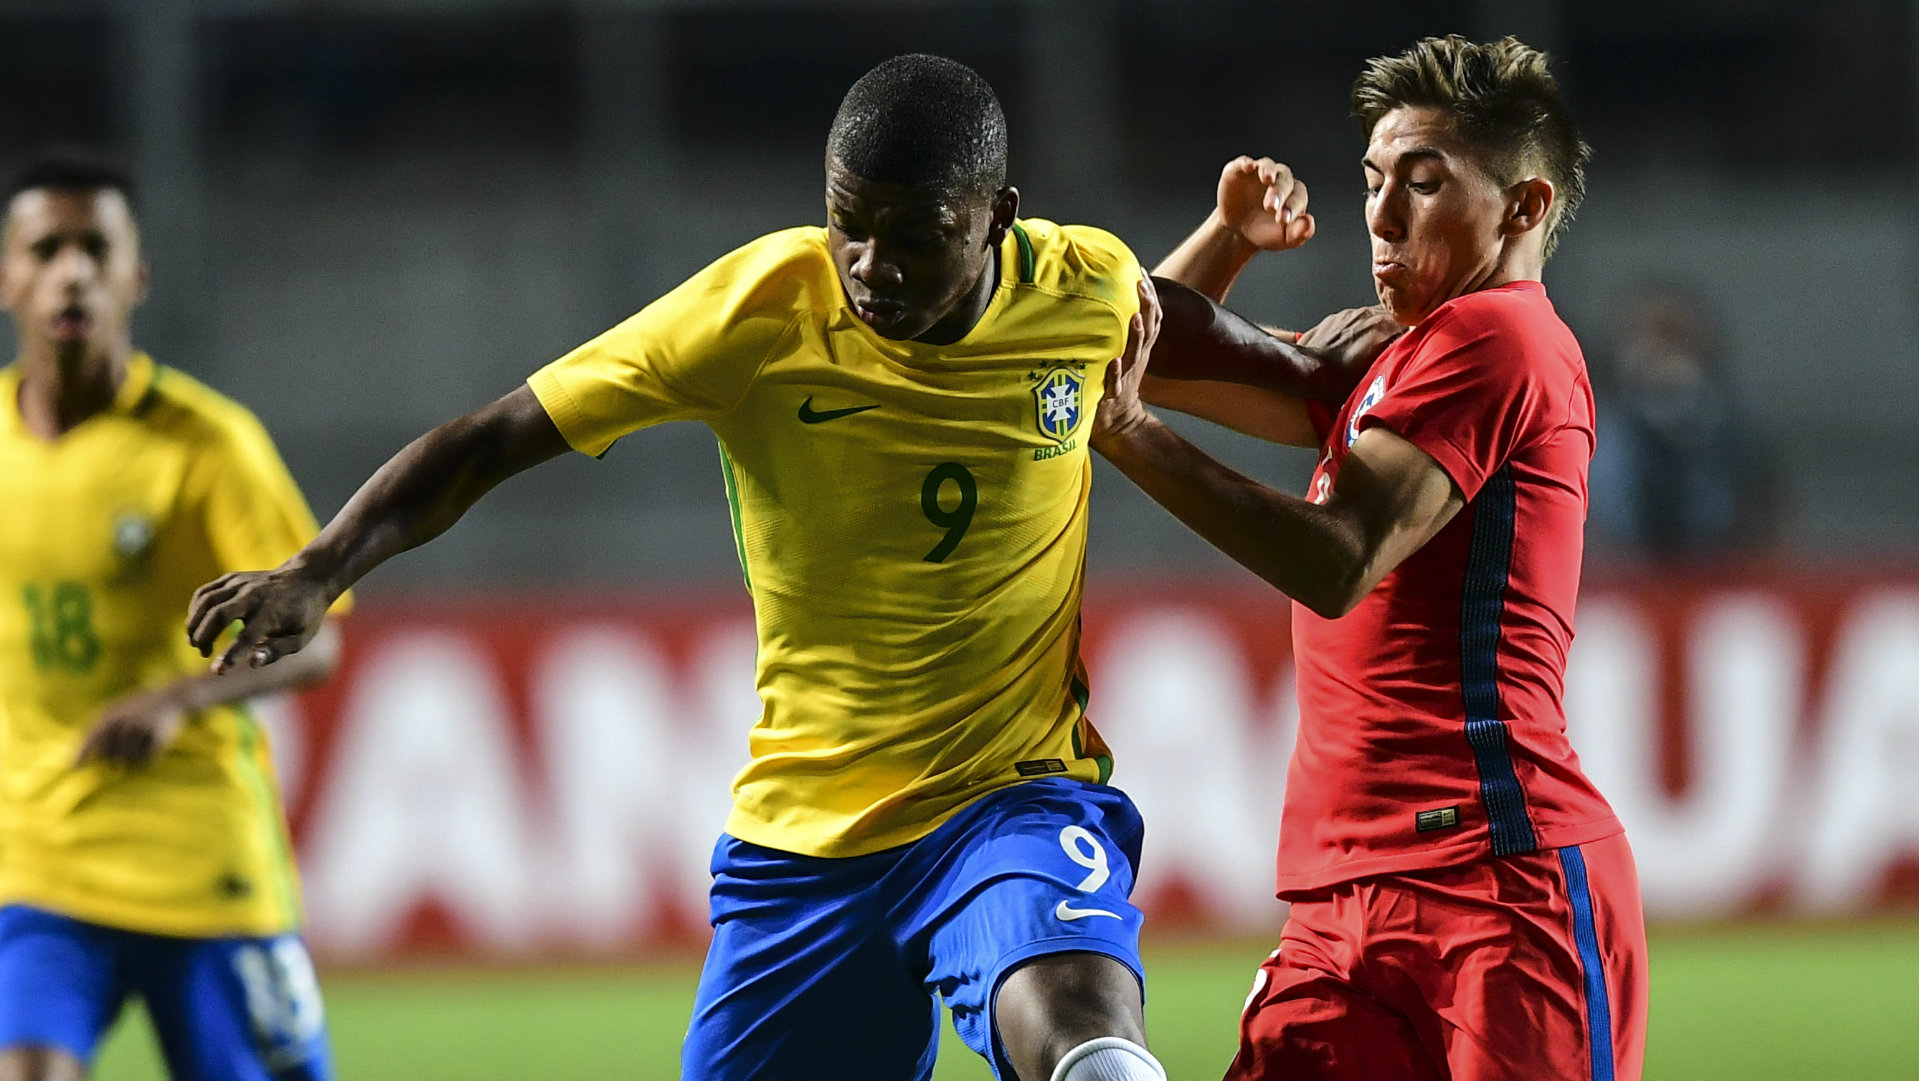 Lincoln, Brazil, U17 World Cup